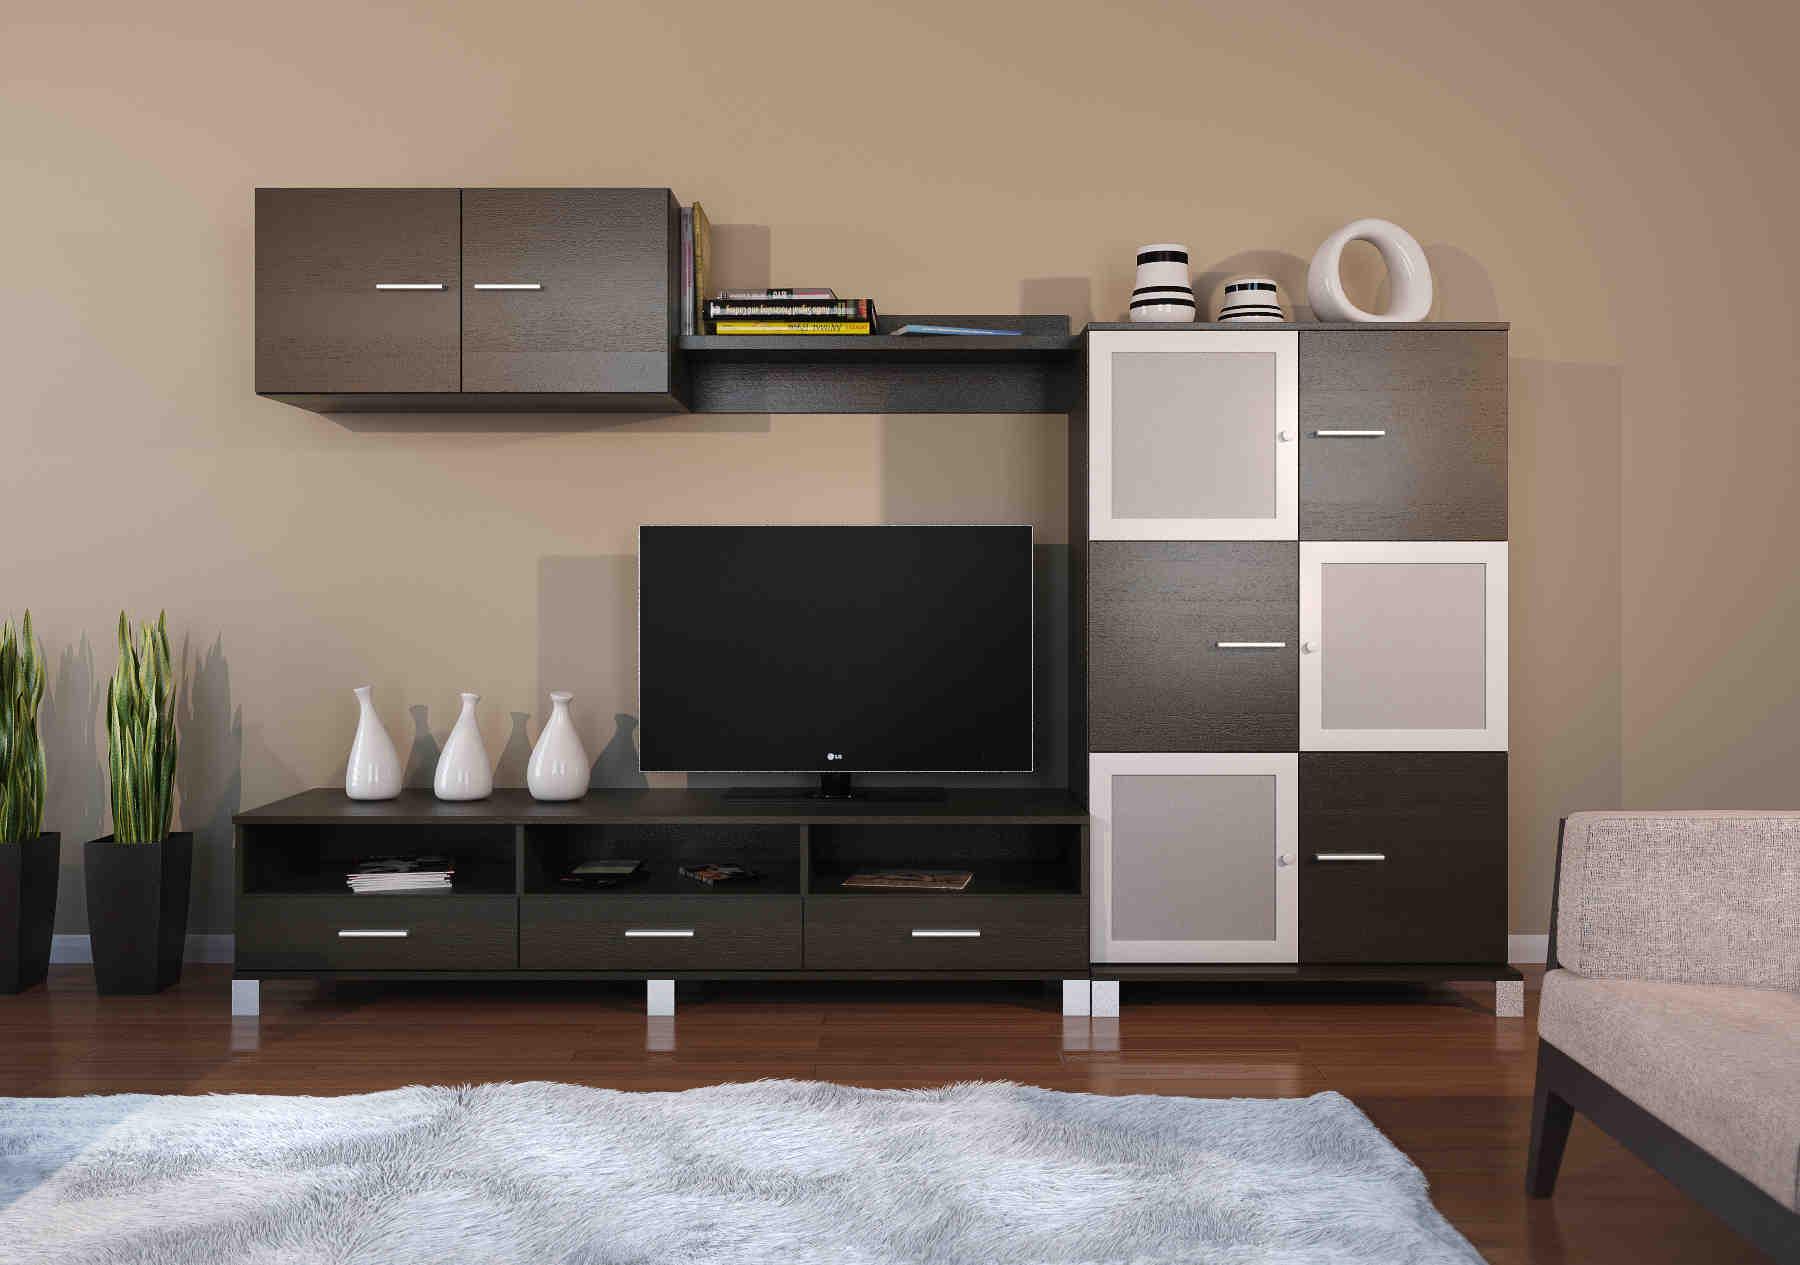 мебель стенка фото